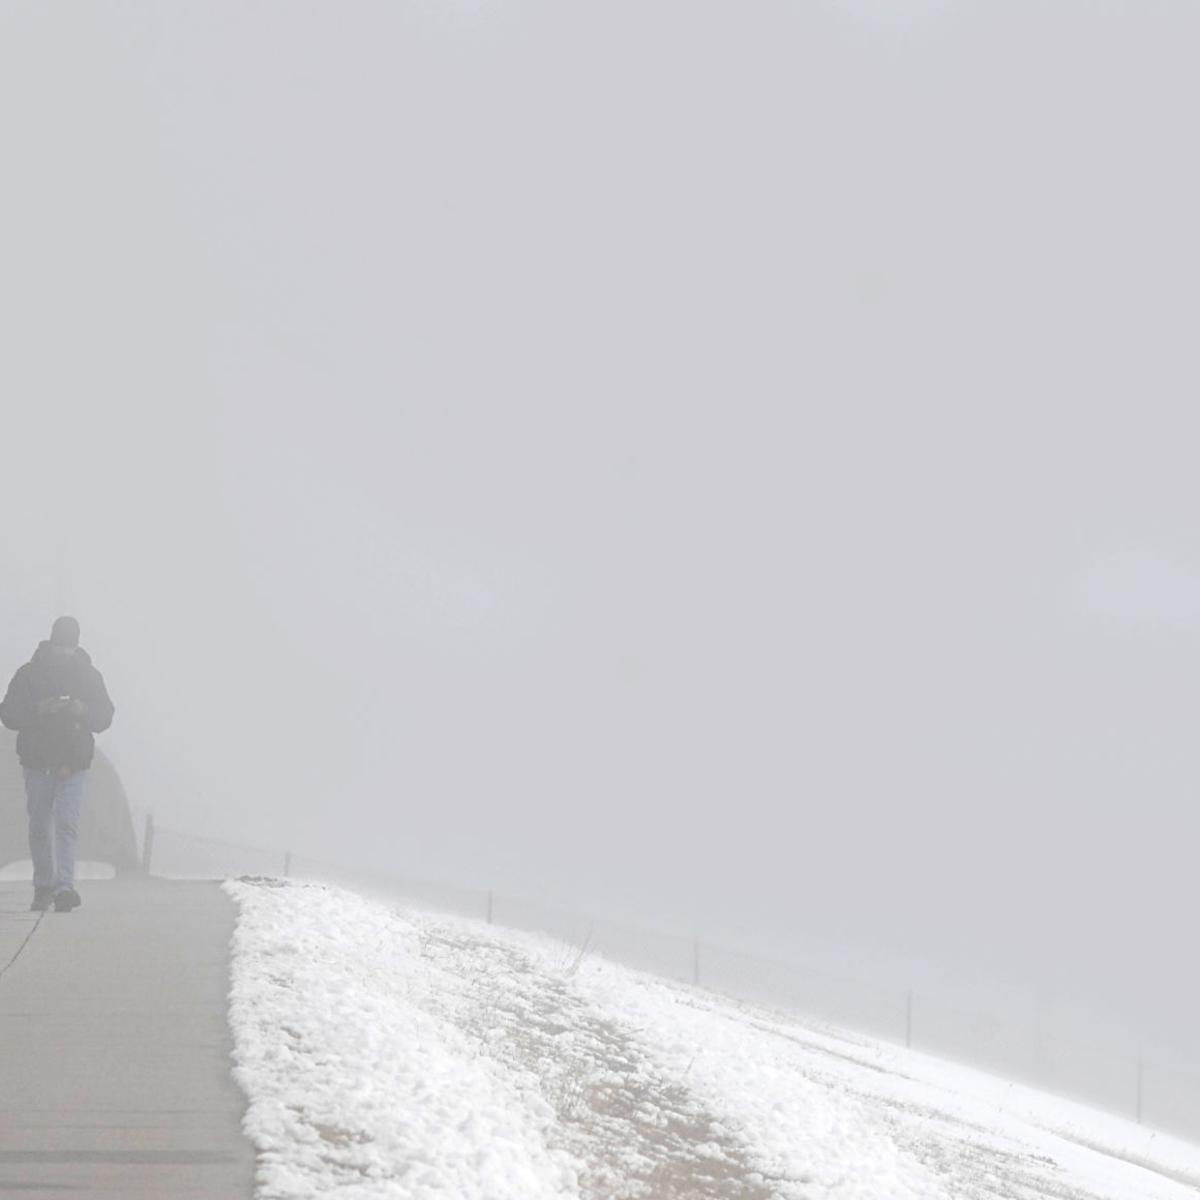 Snow, freezing rain to impact Bismarck, Mandan | Local news